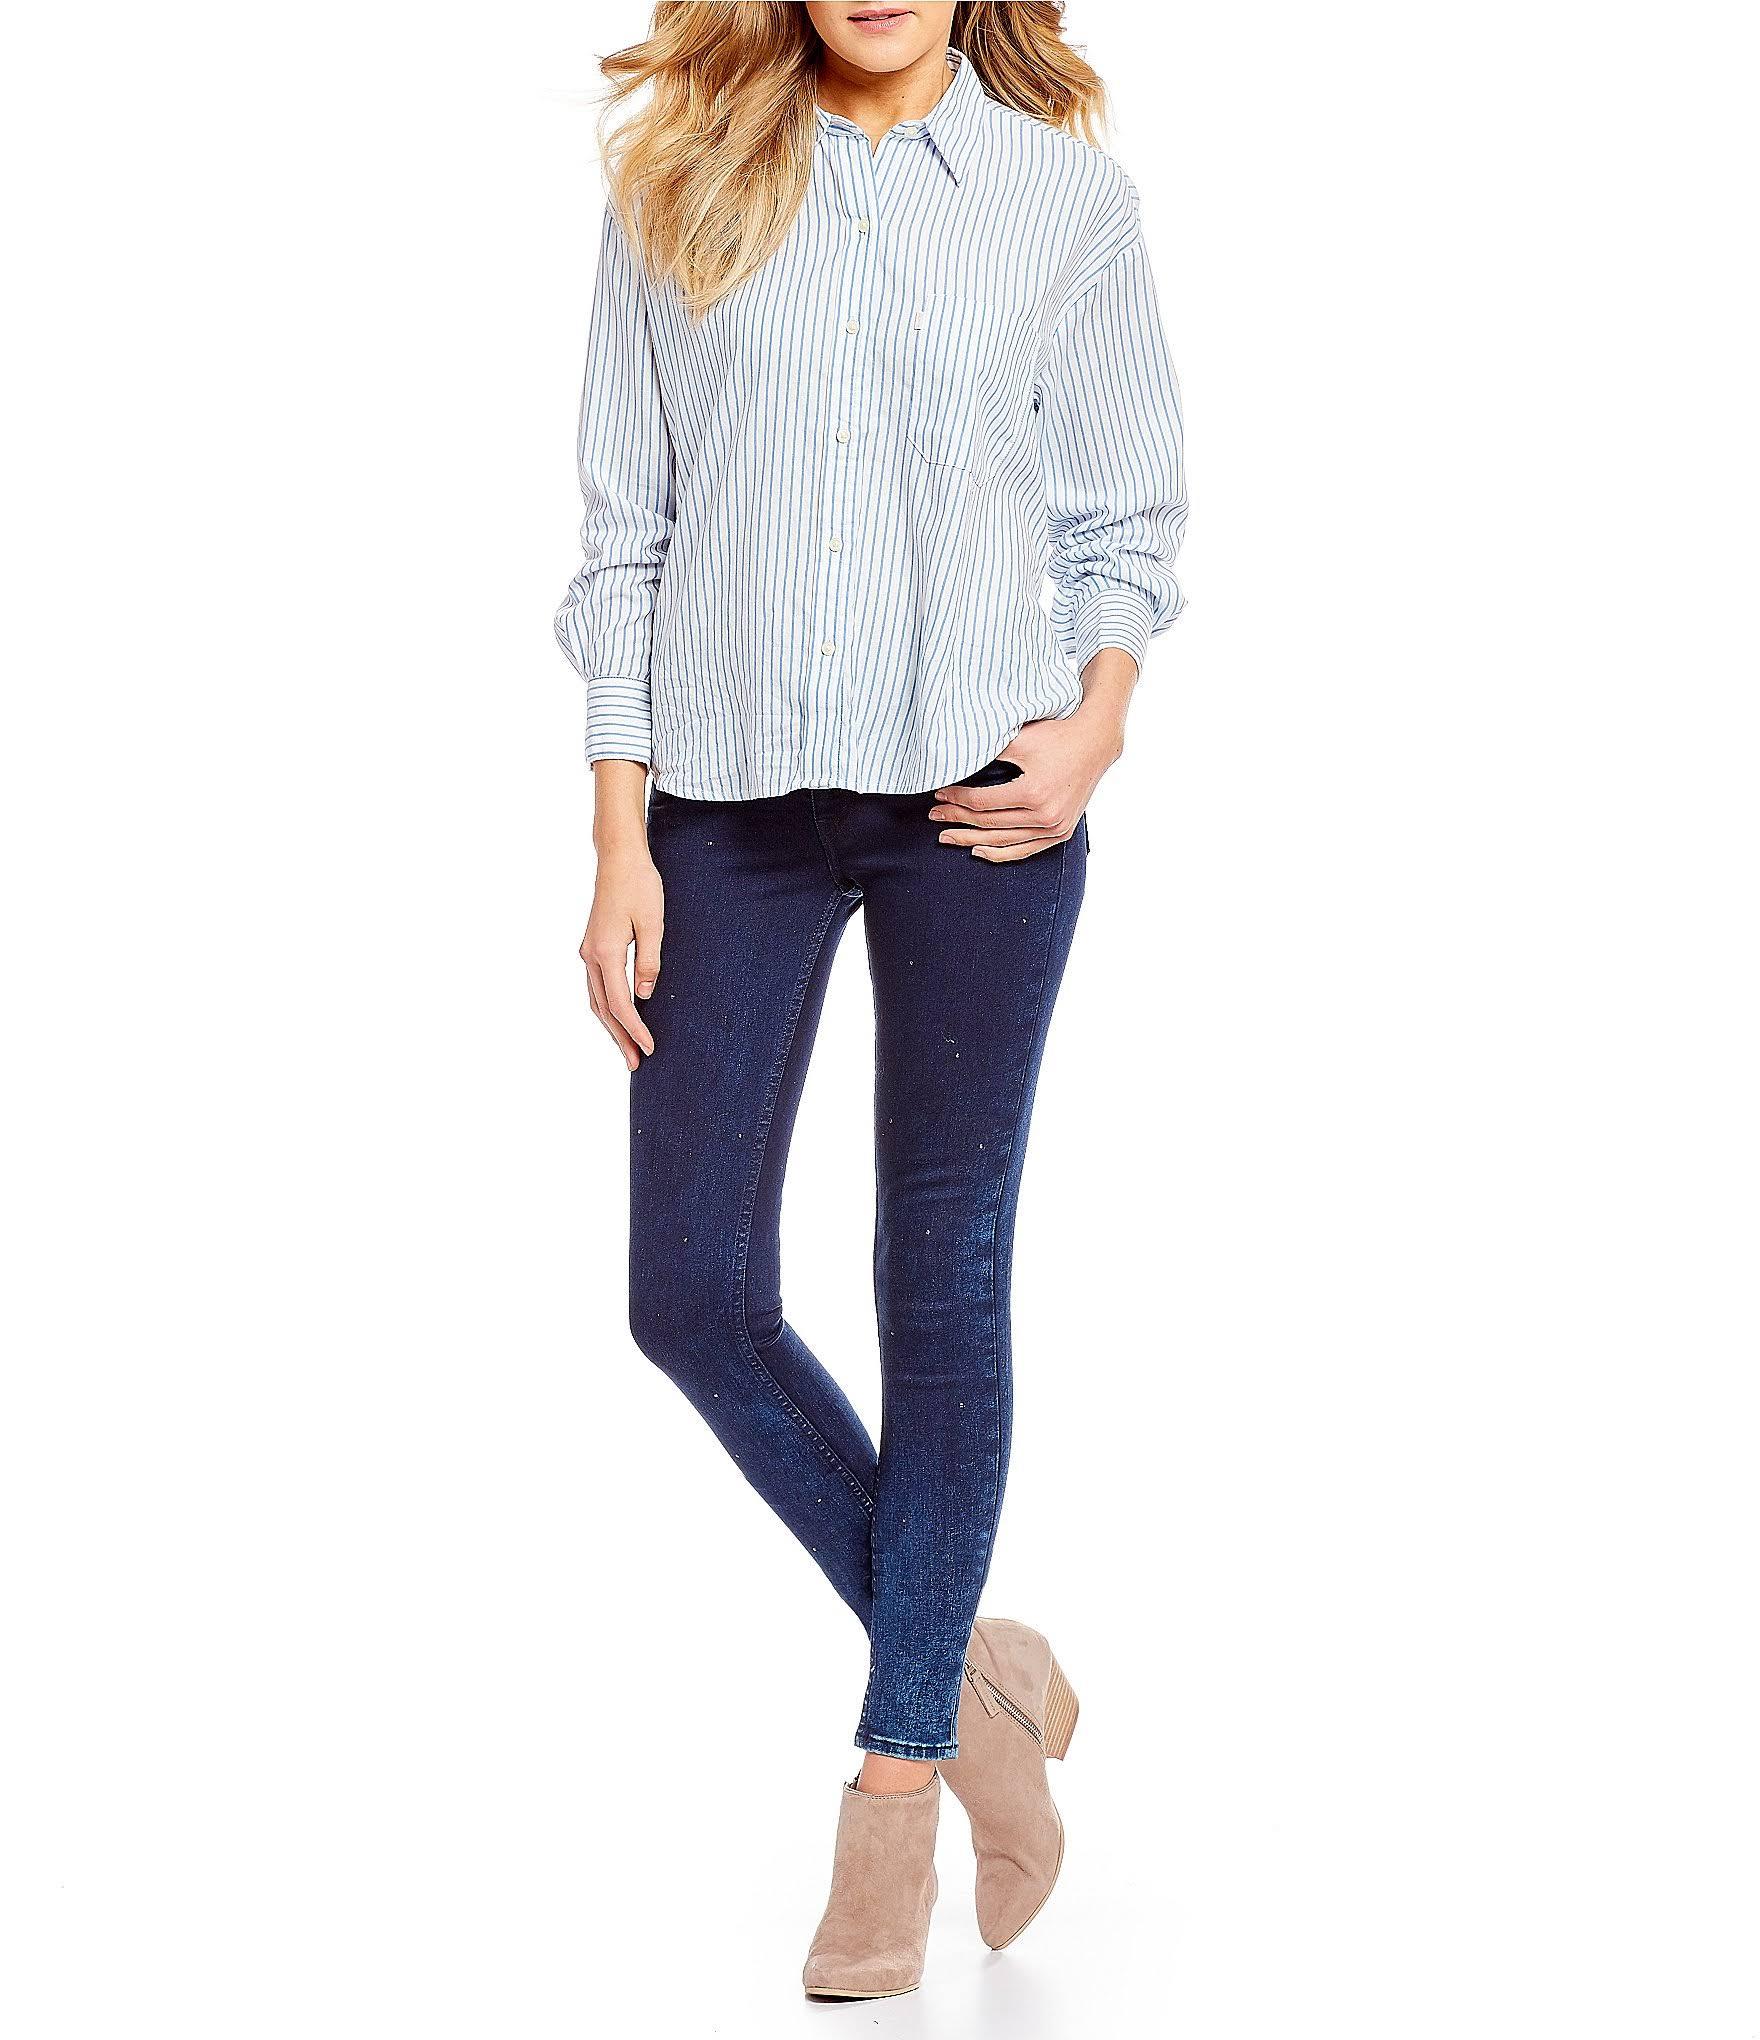 Blau 535 Jeans Skinny Super Levi's 27r aCvqv